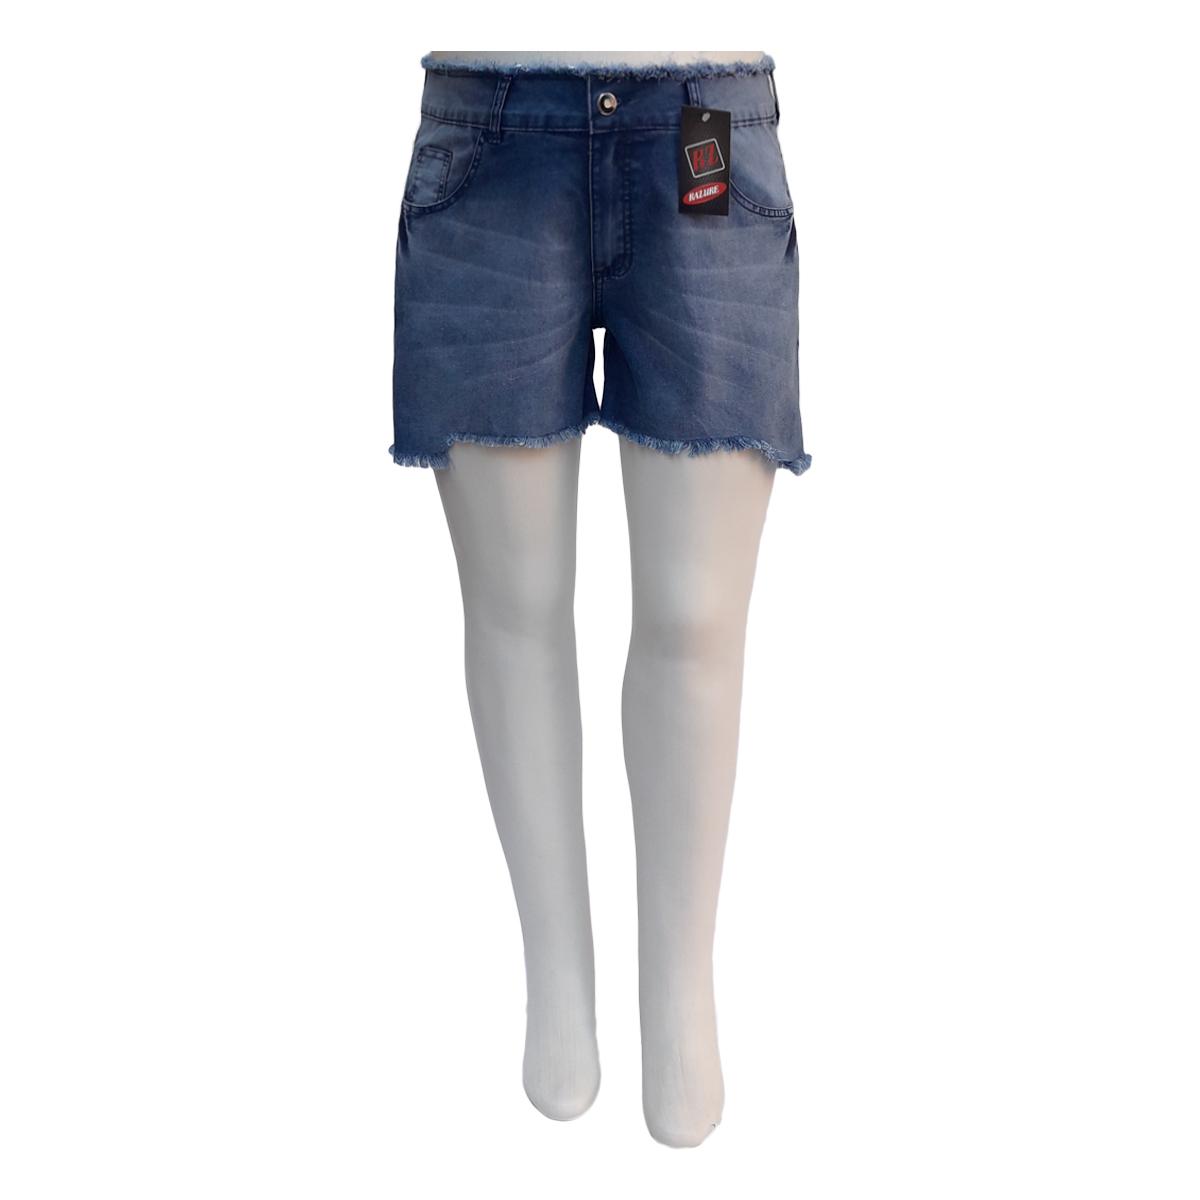 Short Jeans Feminino Barra Simétrica Cós Desfiado Plus Size